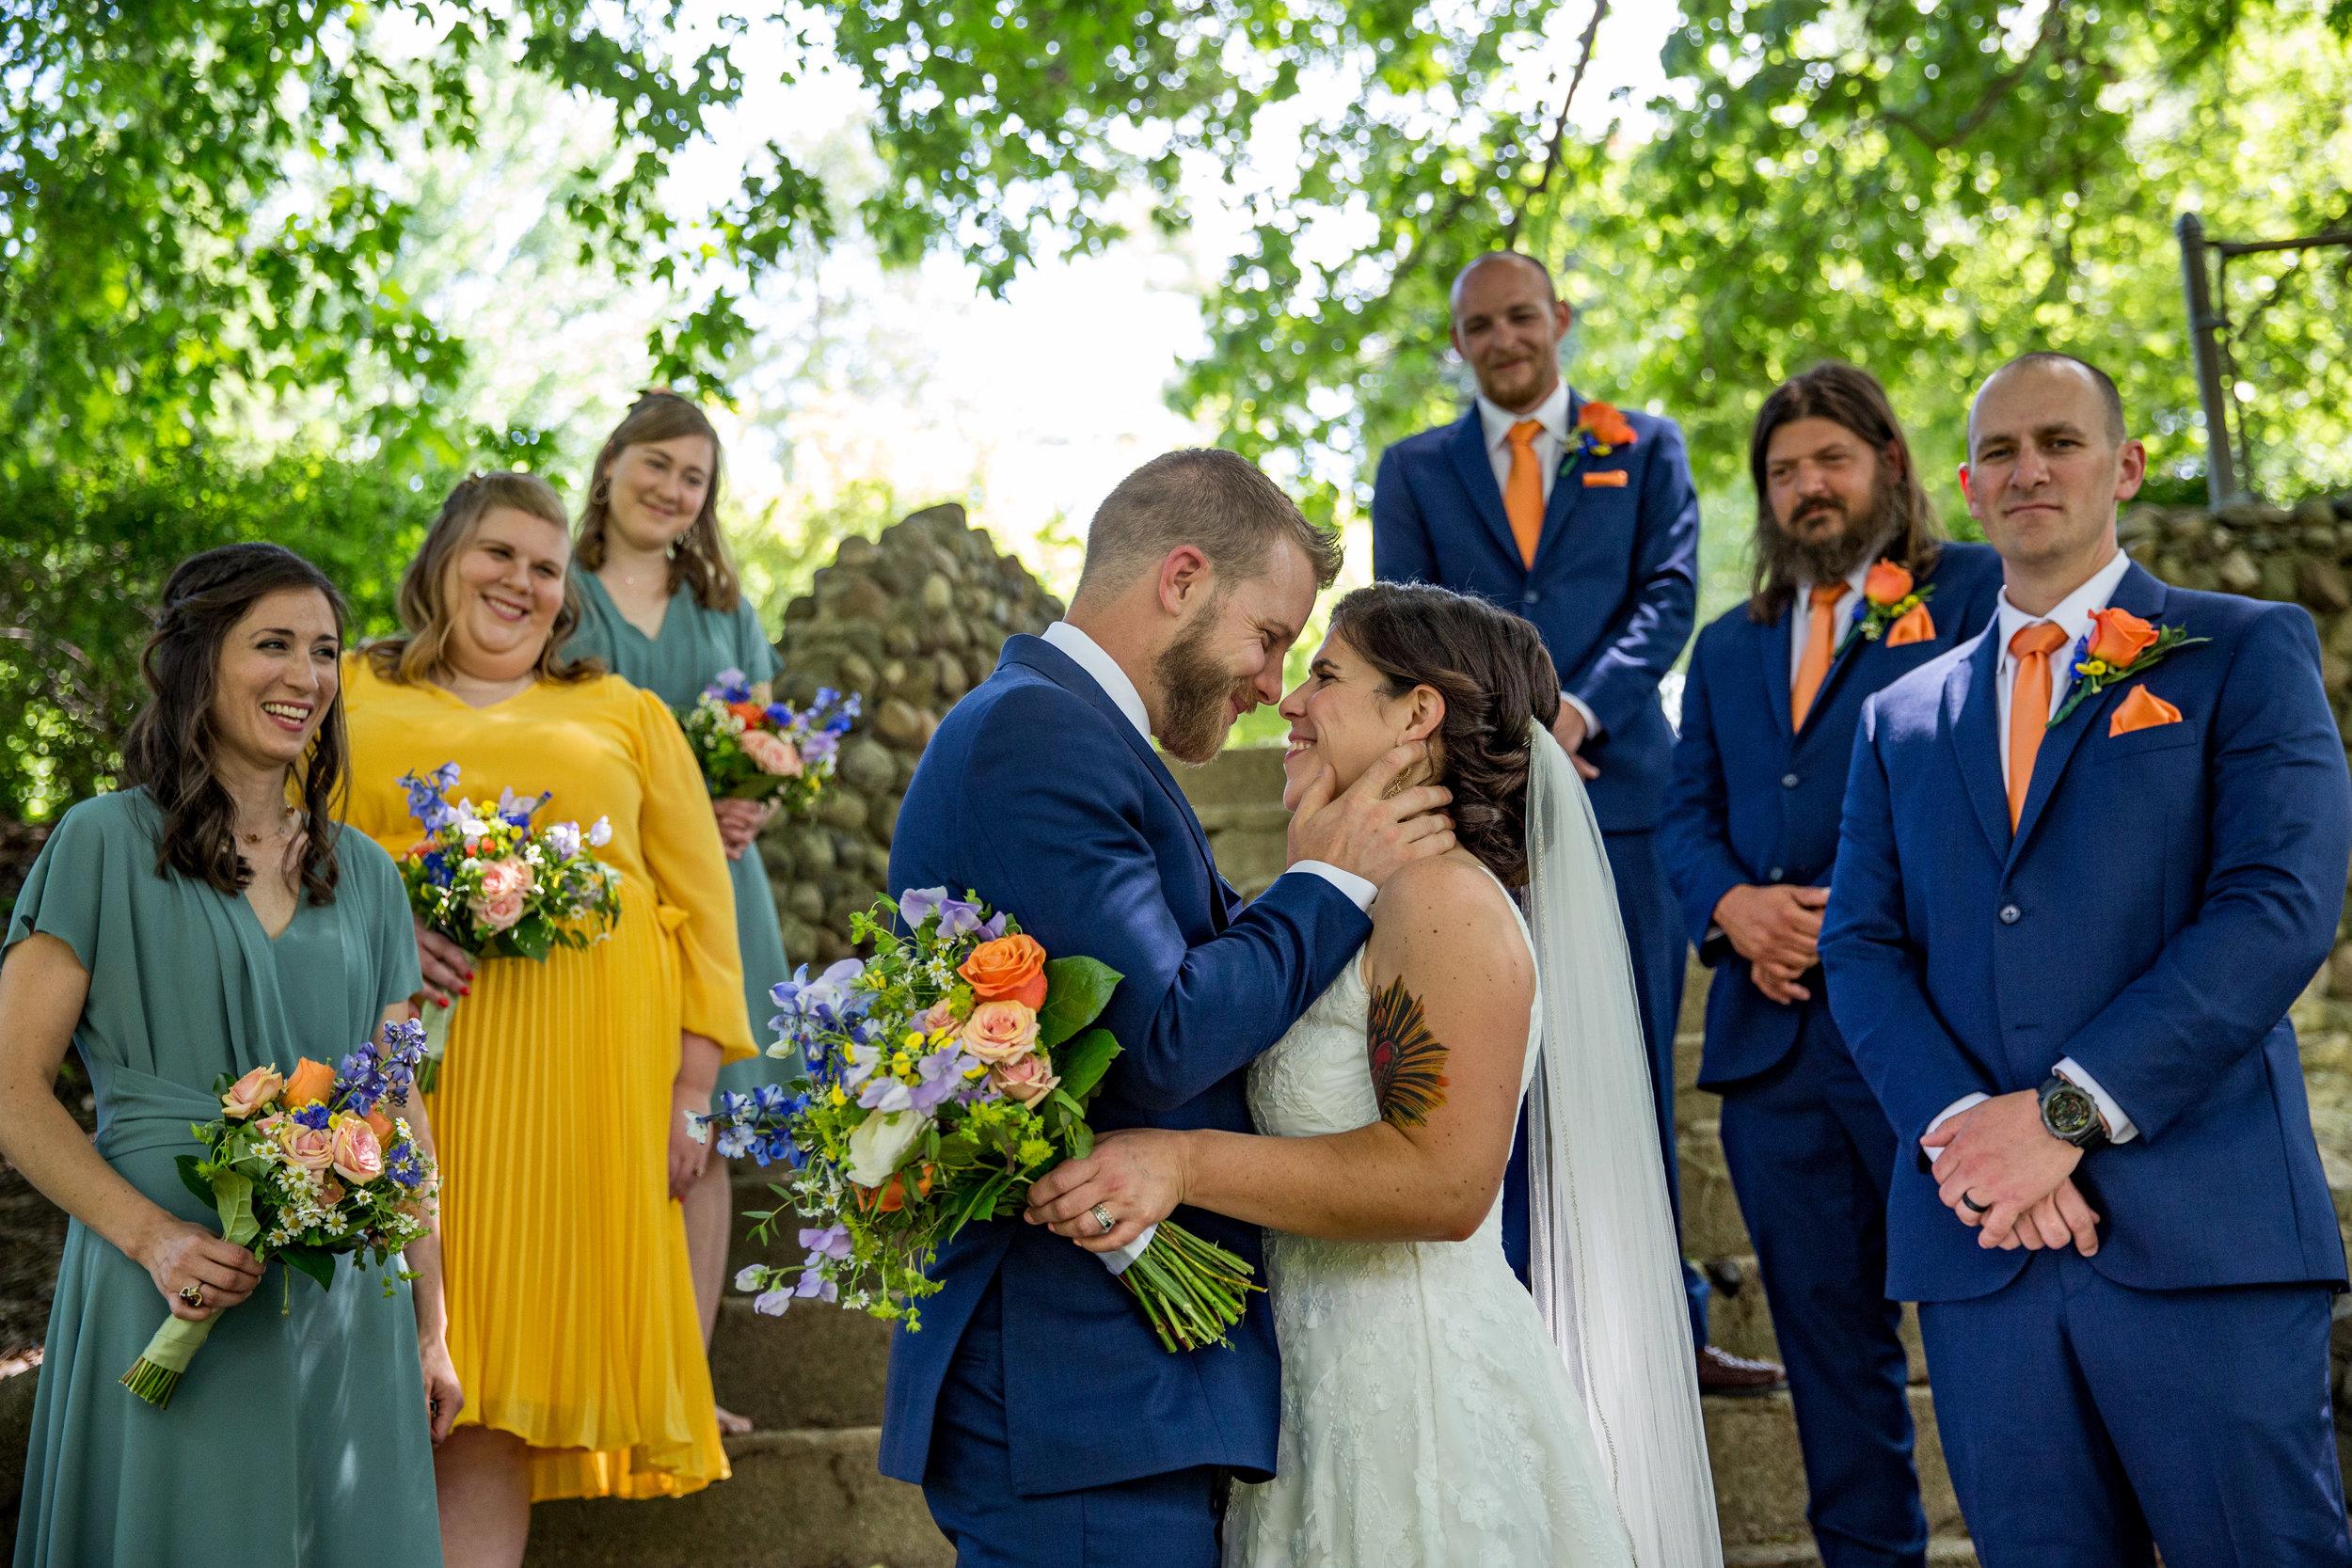 Natalie and Dallas Mooney Wedding 6-8-19_Tania Watt Photography-303.jpg